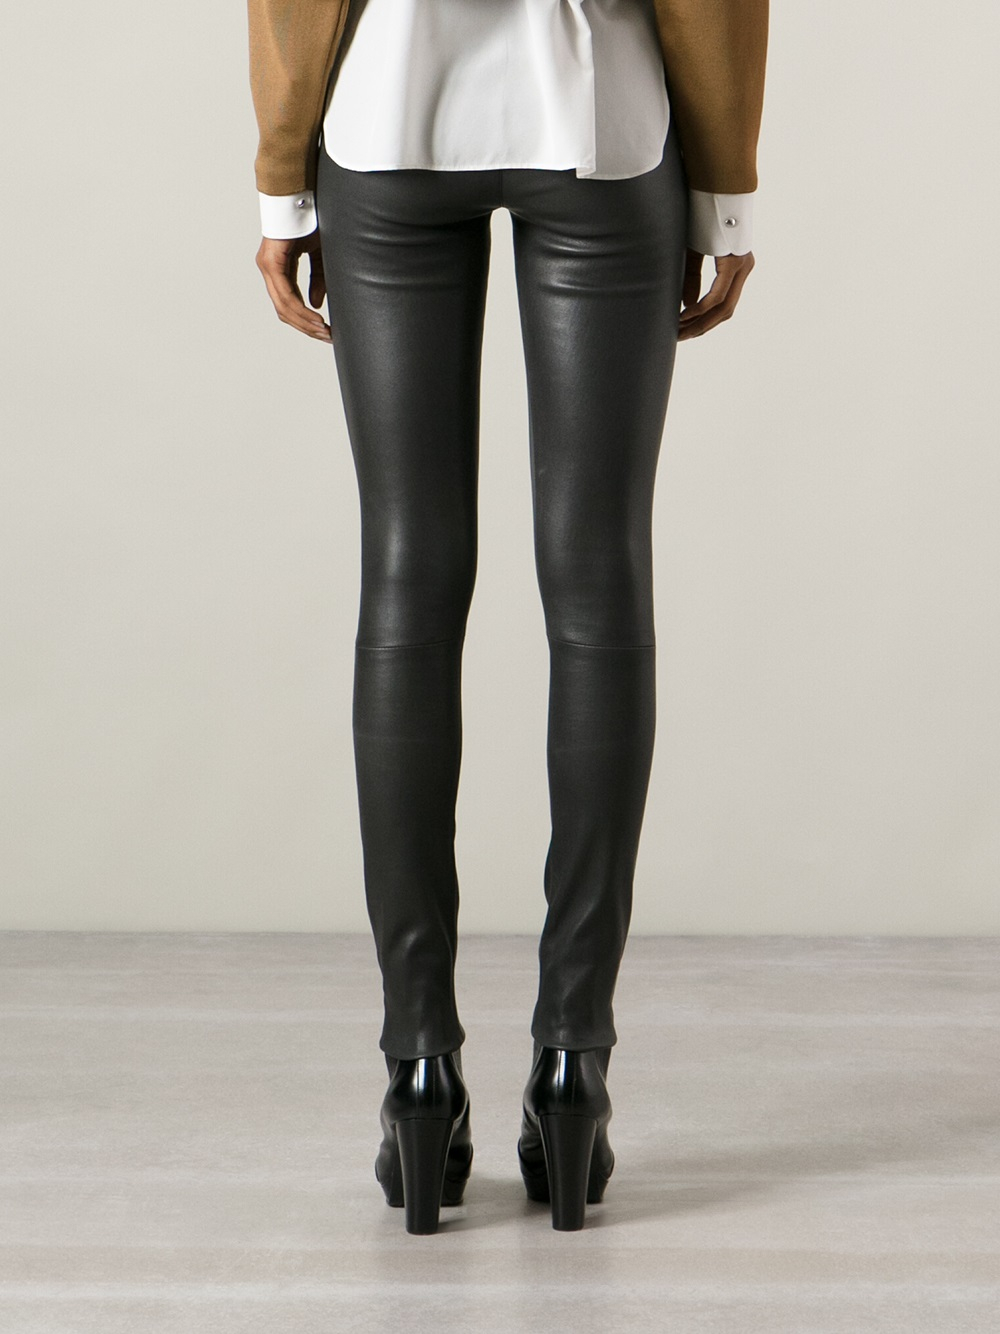 lyst drome leather leggings in black